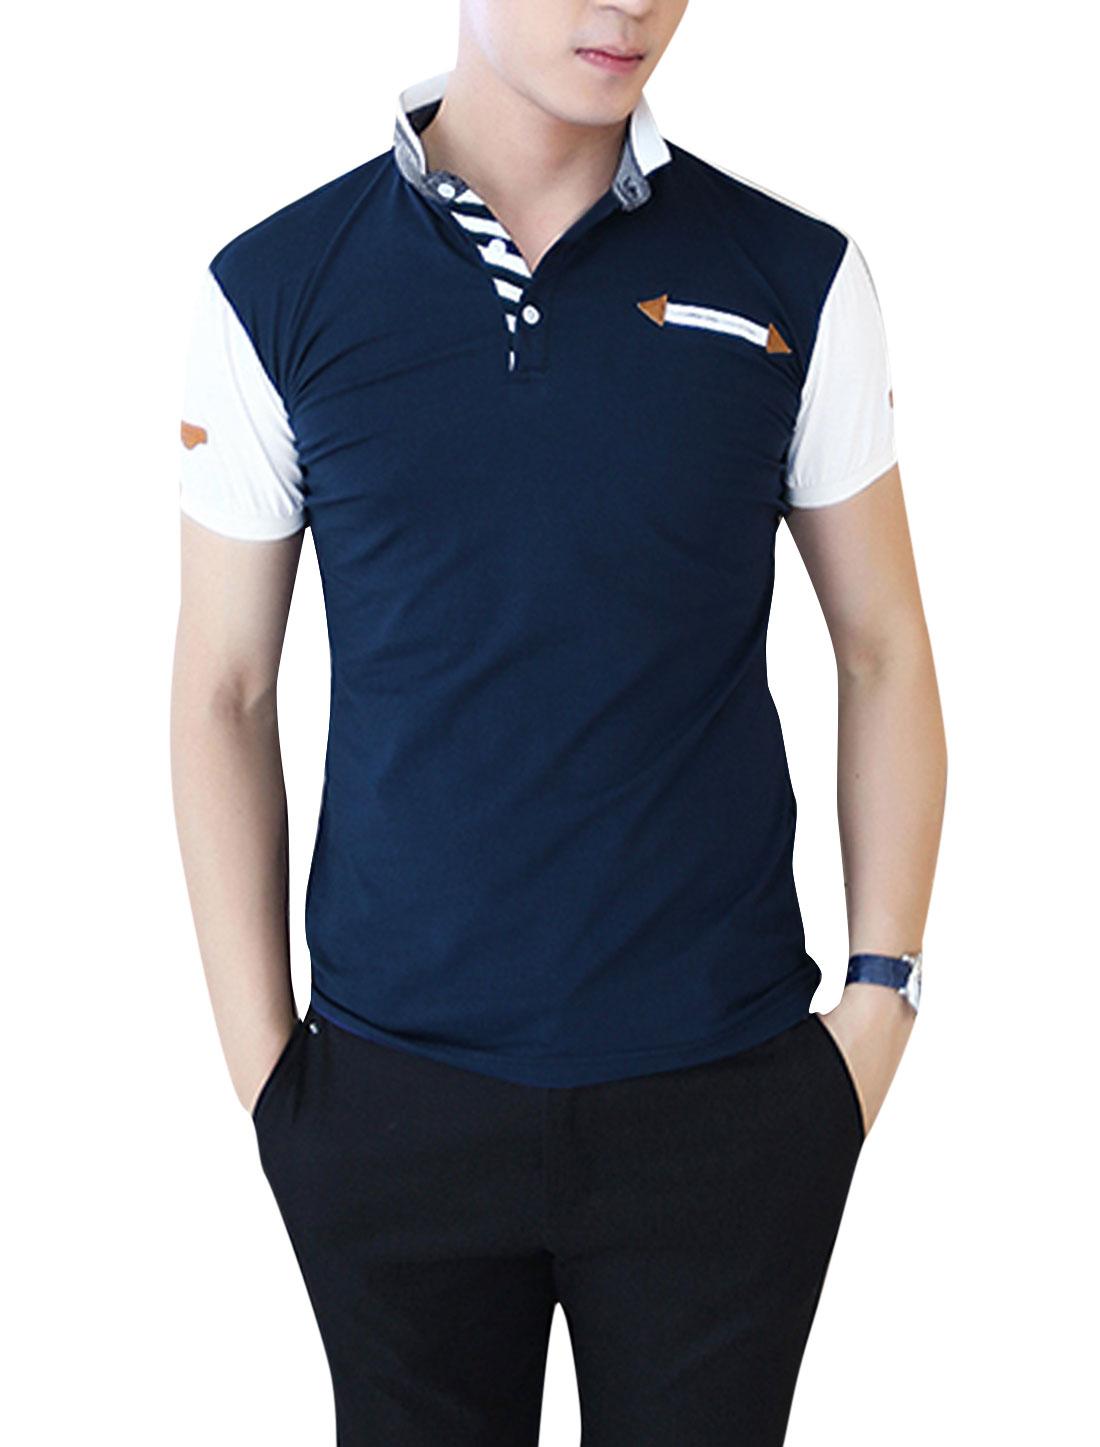 Men Imitation Leather Spliced Detail Polo Shirt Dark Blue M